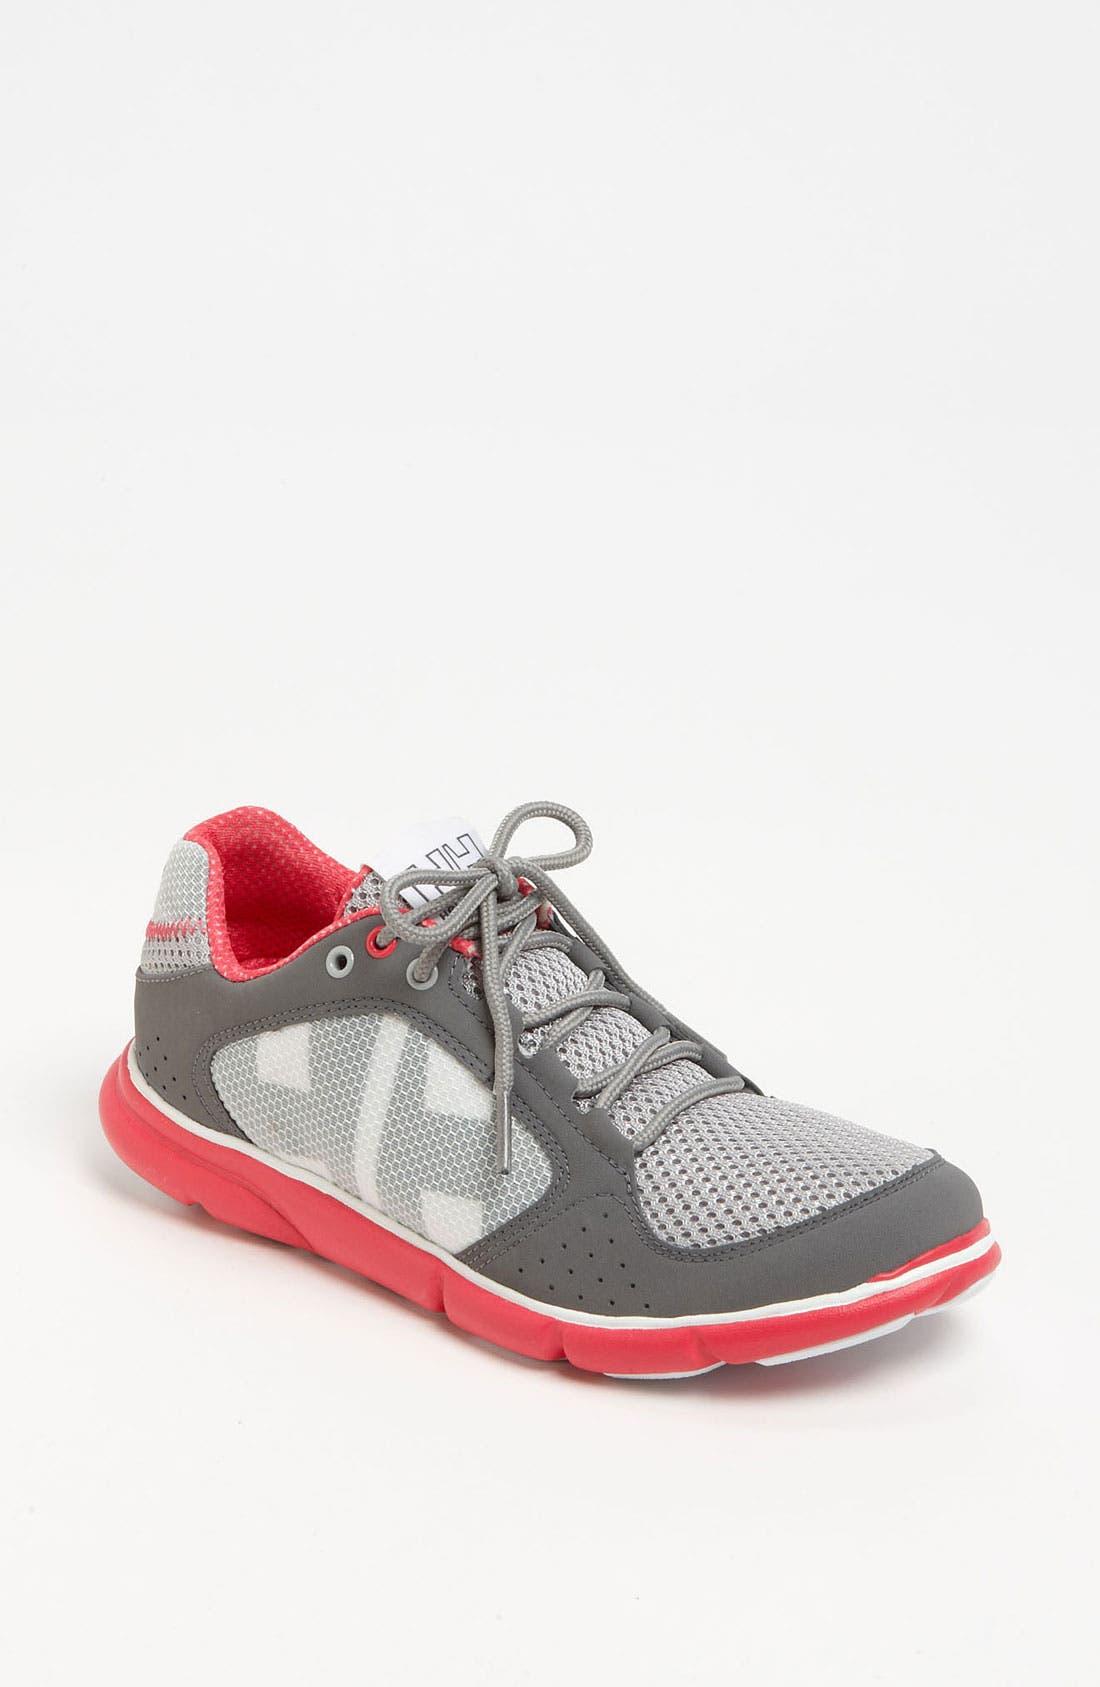 Alternate Image 1 Selected - Helly Hansen 'Ahiga' Running Shoe (Women)